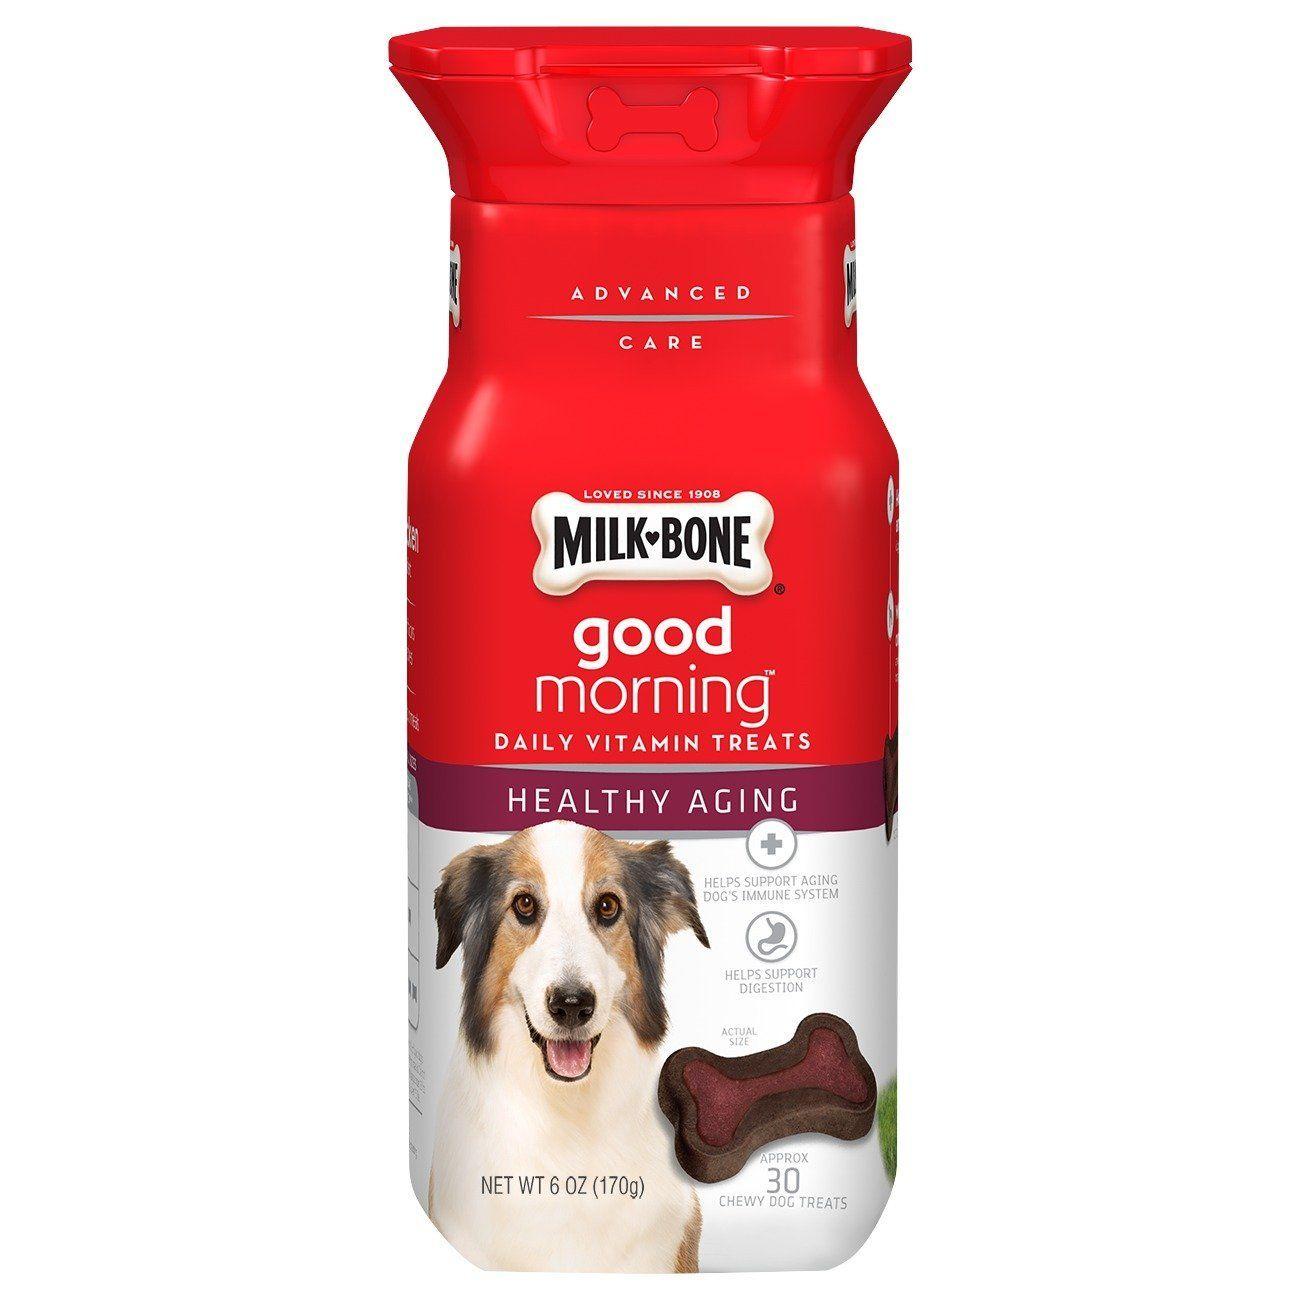 Milkbone good morning daily vitamin dog treats check